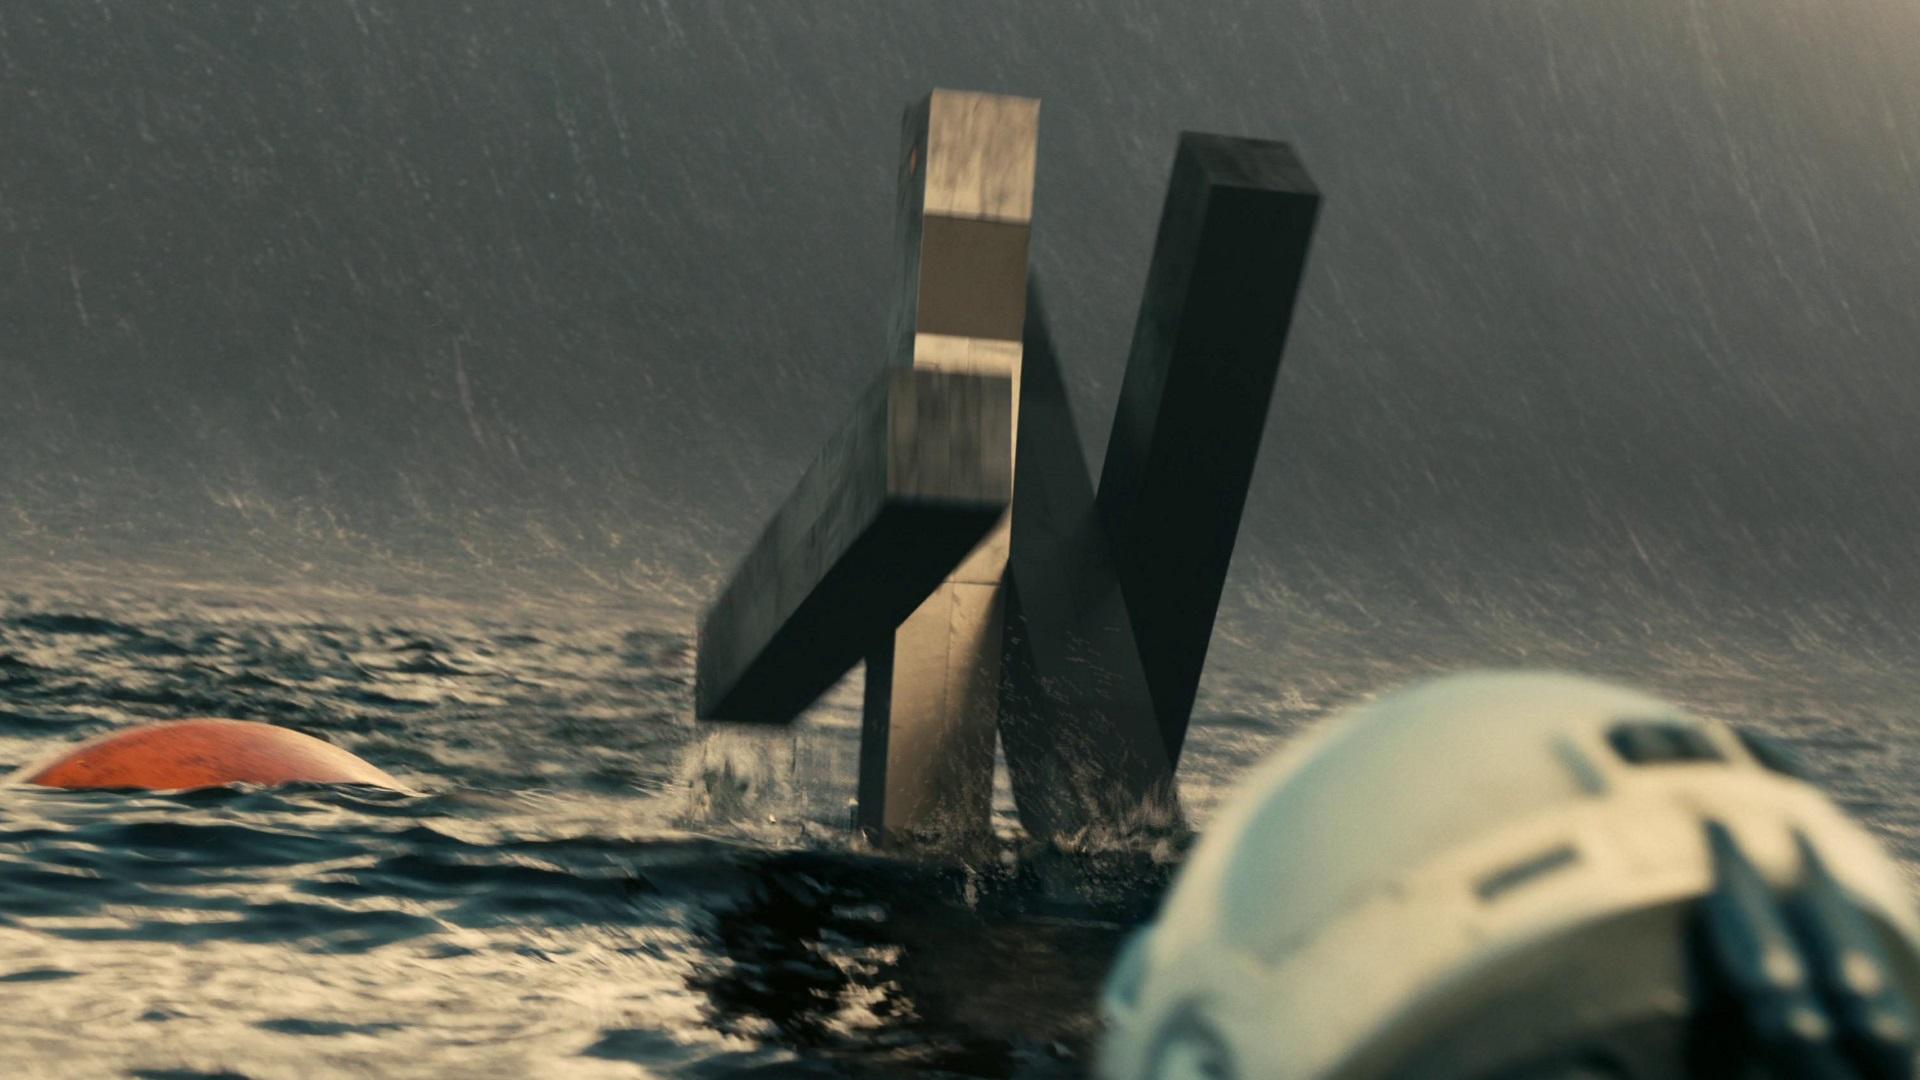 """Interstellar"" (2014) - Best Visual Effects Shortlisted - We Live Film"